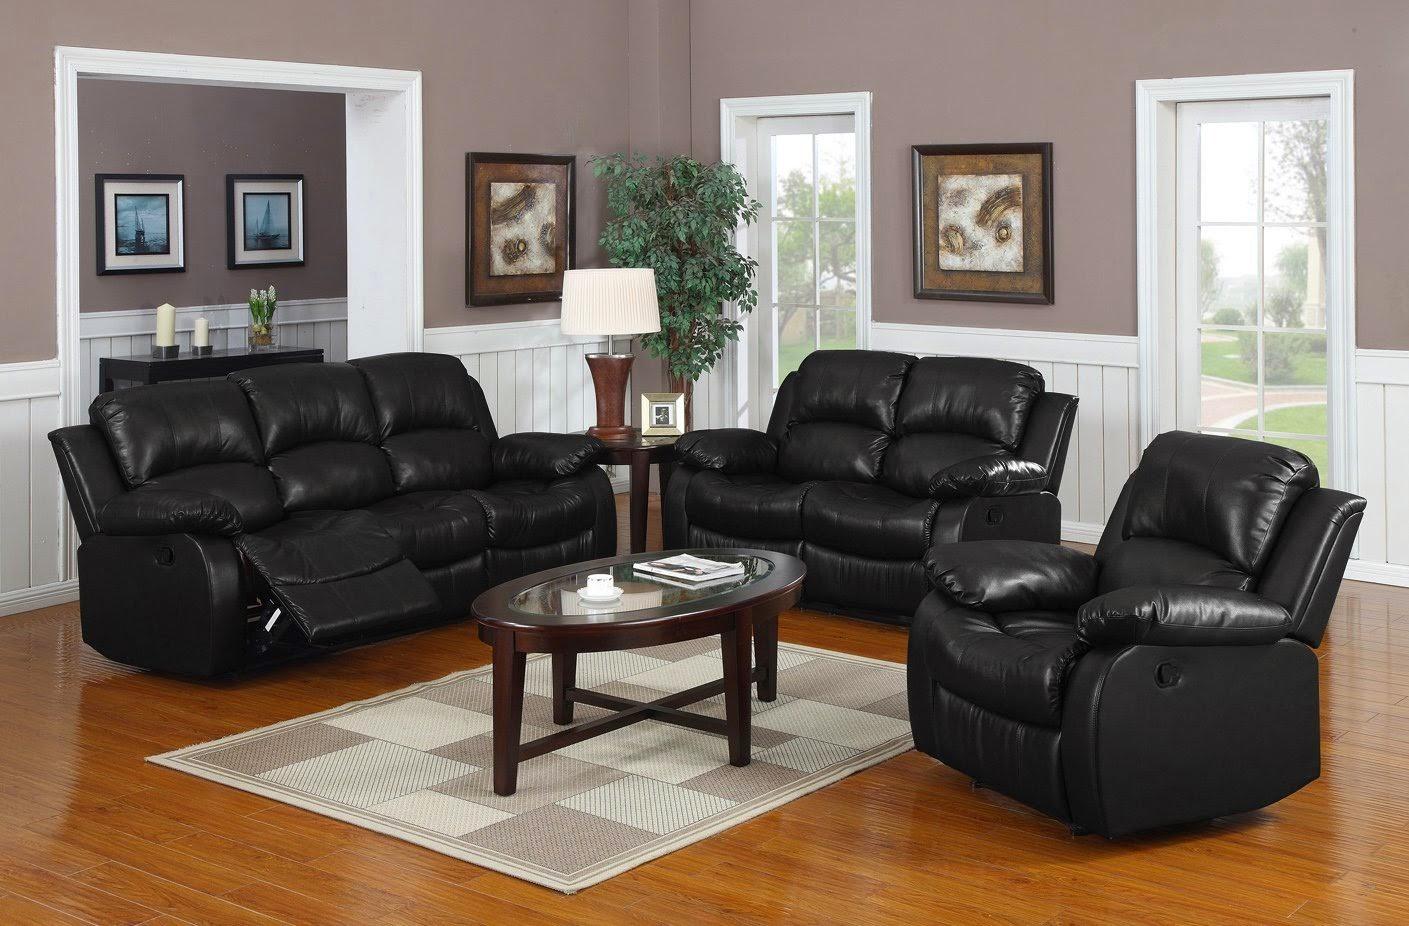 Milano Leather Recliner Sofa Set Reviews